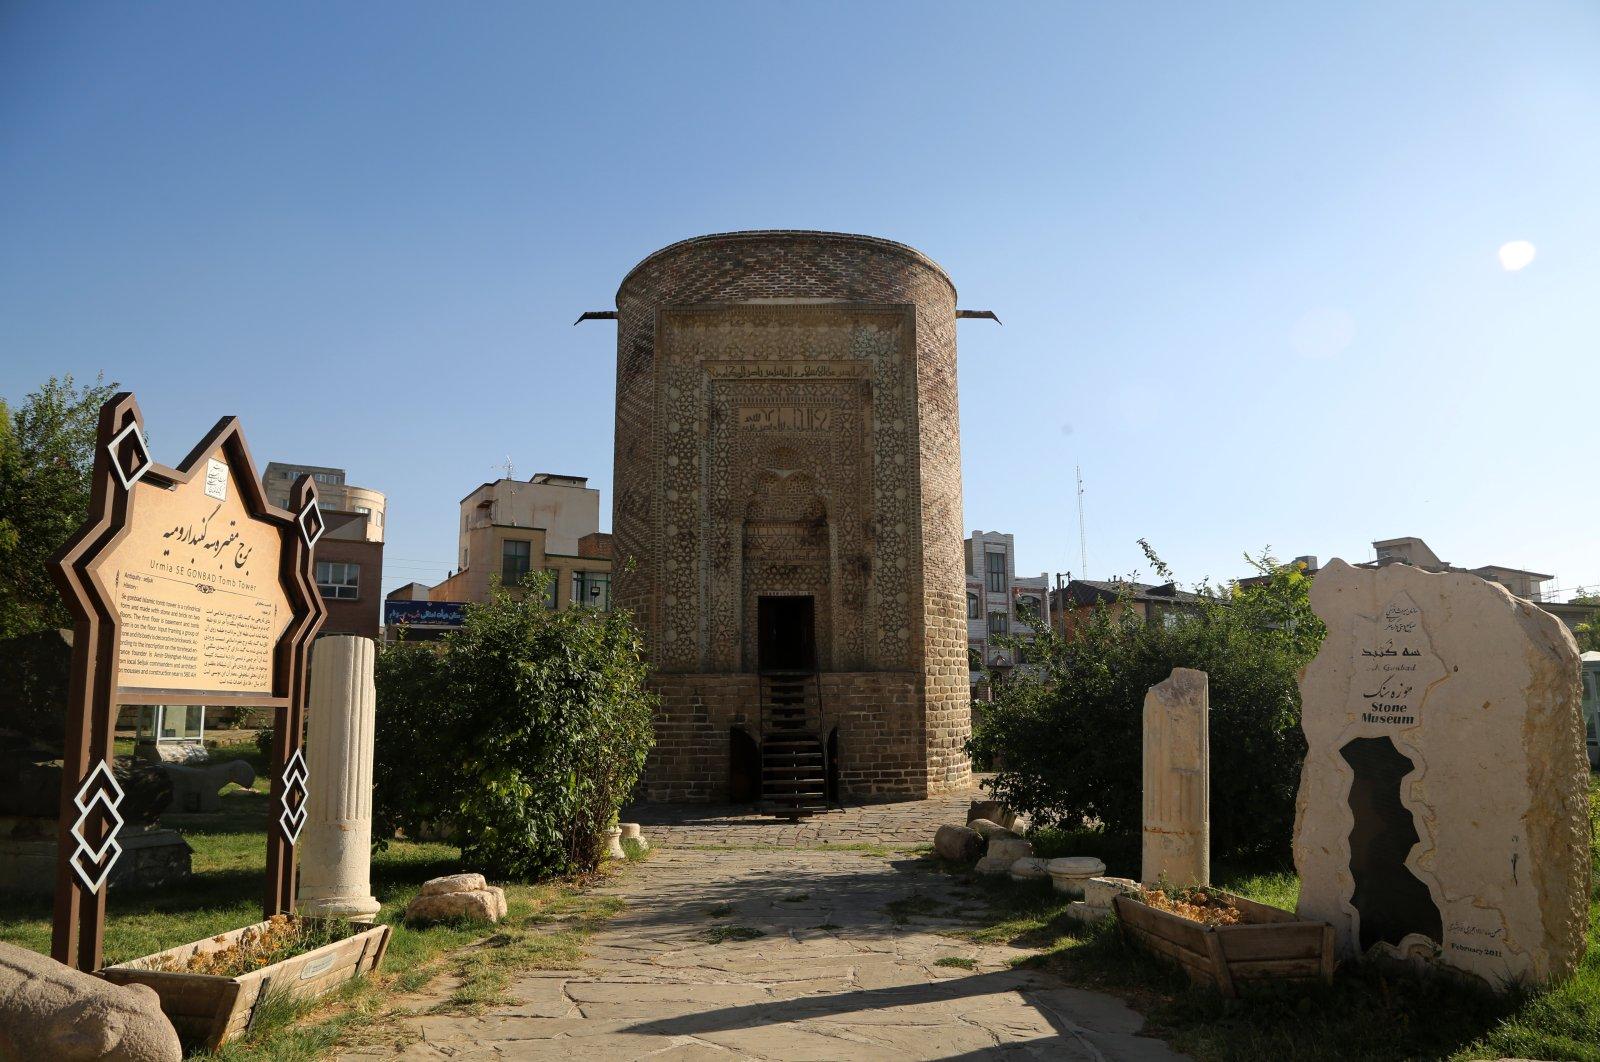 A general view from Segonbad, West Azerbaijan, Urmia, Iran, July 11, 2021. (AA Photo)